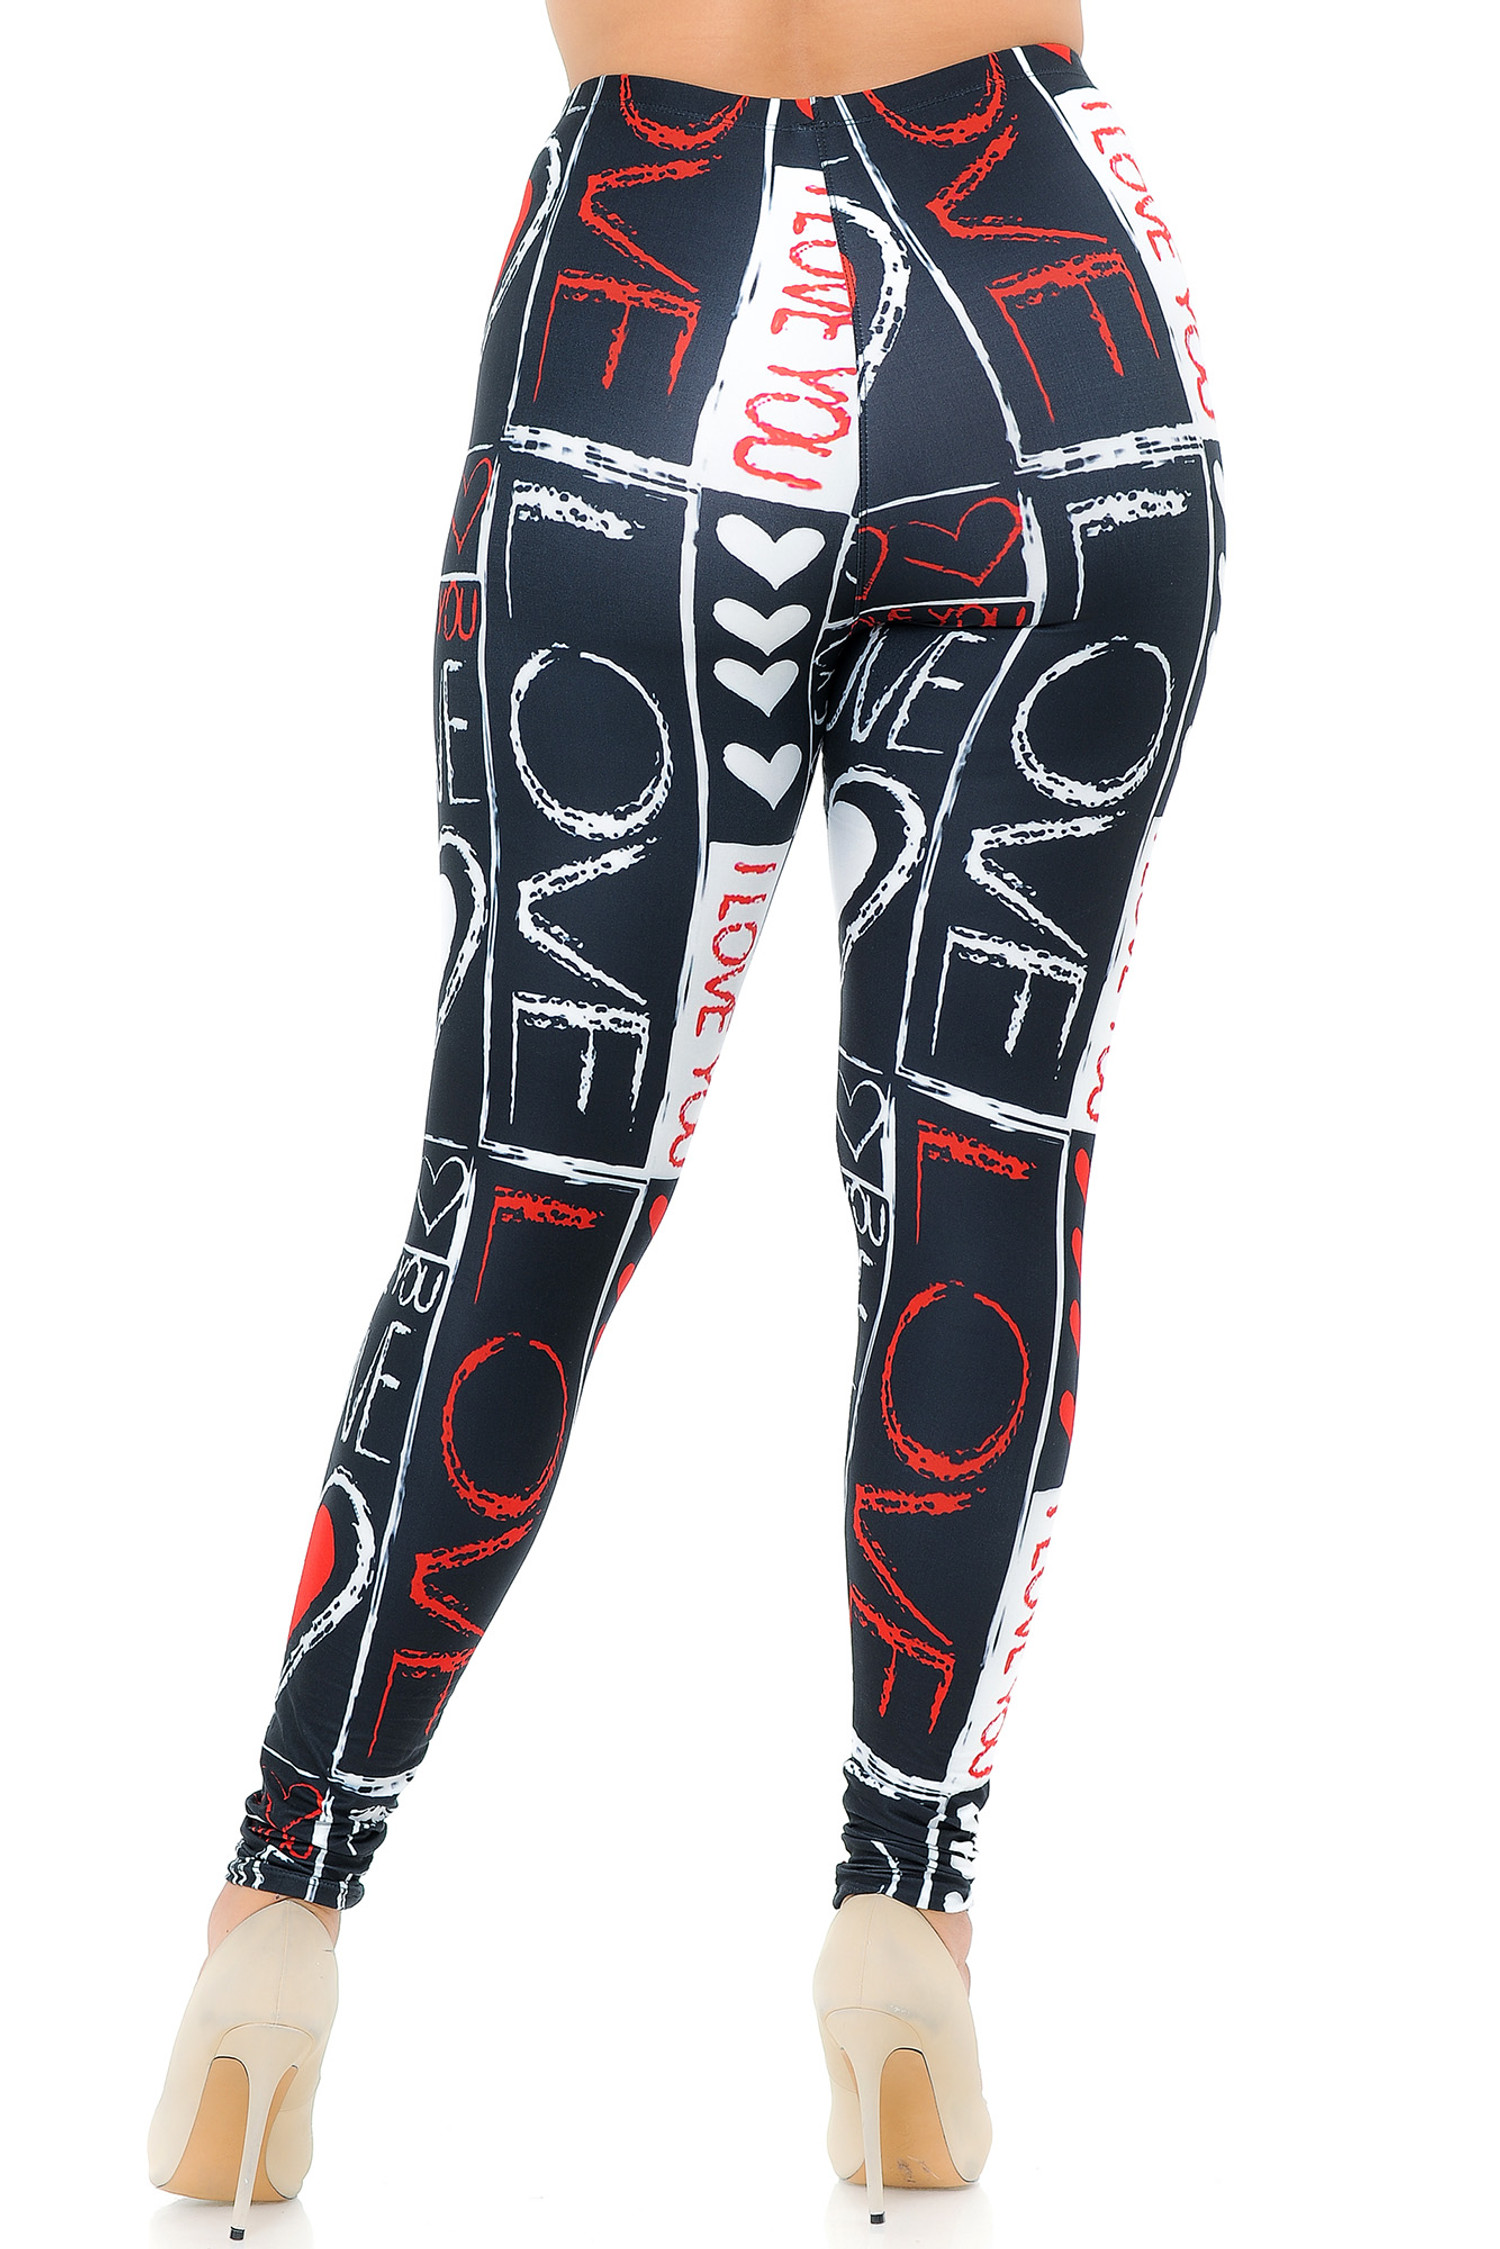 Creamy Soft Heart and Love Plus Size Leggings - USA Fashion™